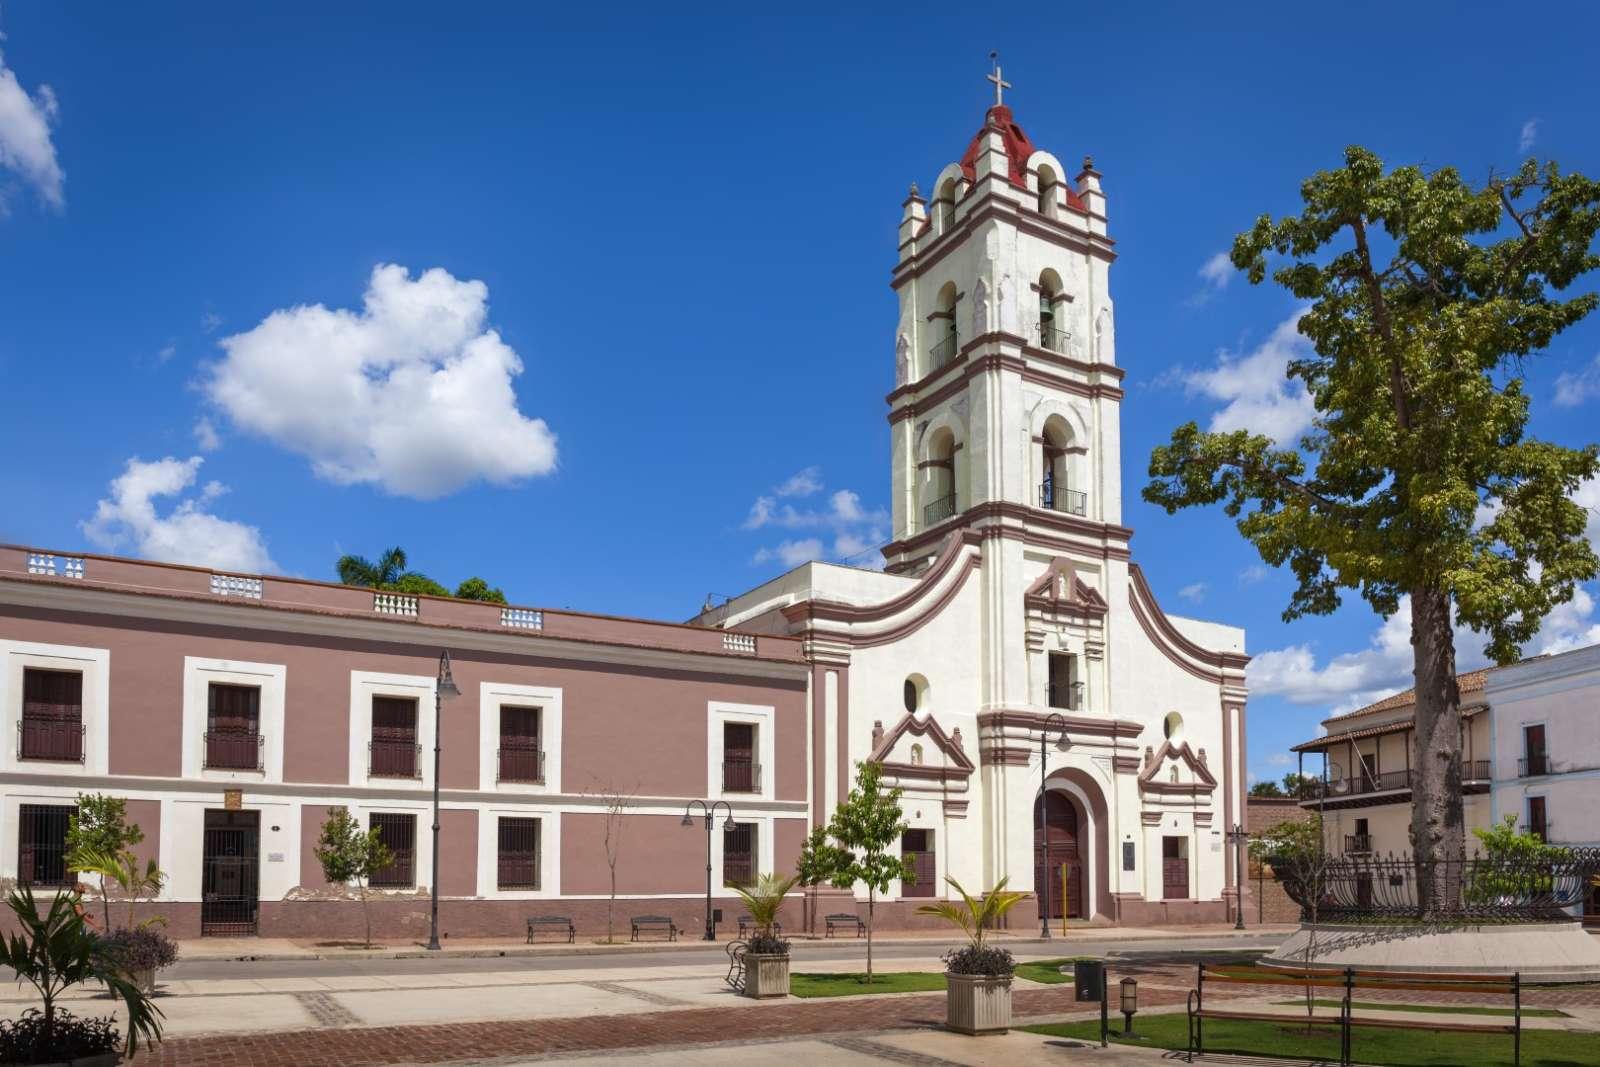 The church of Nuestra Senora de la Merced in Camaguey, Cuba